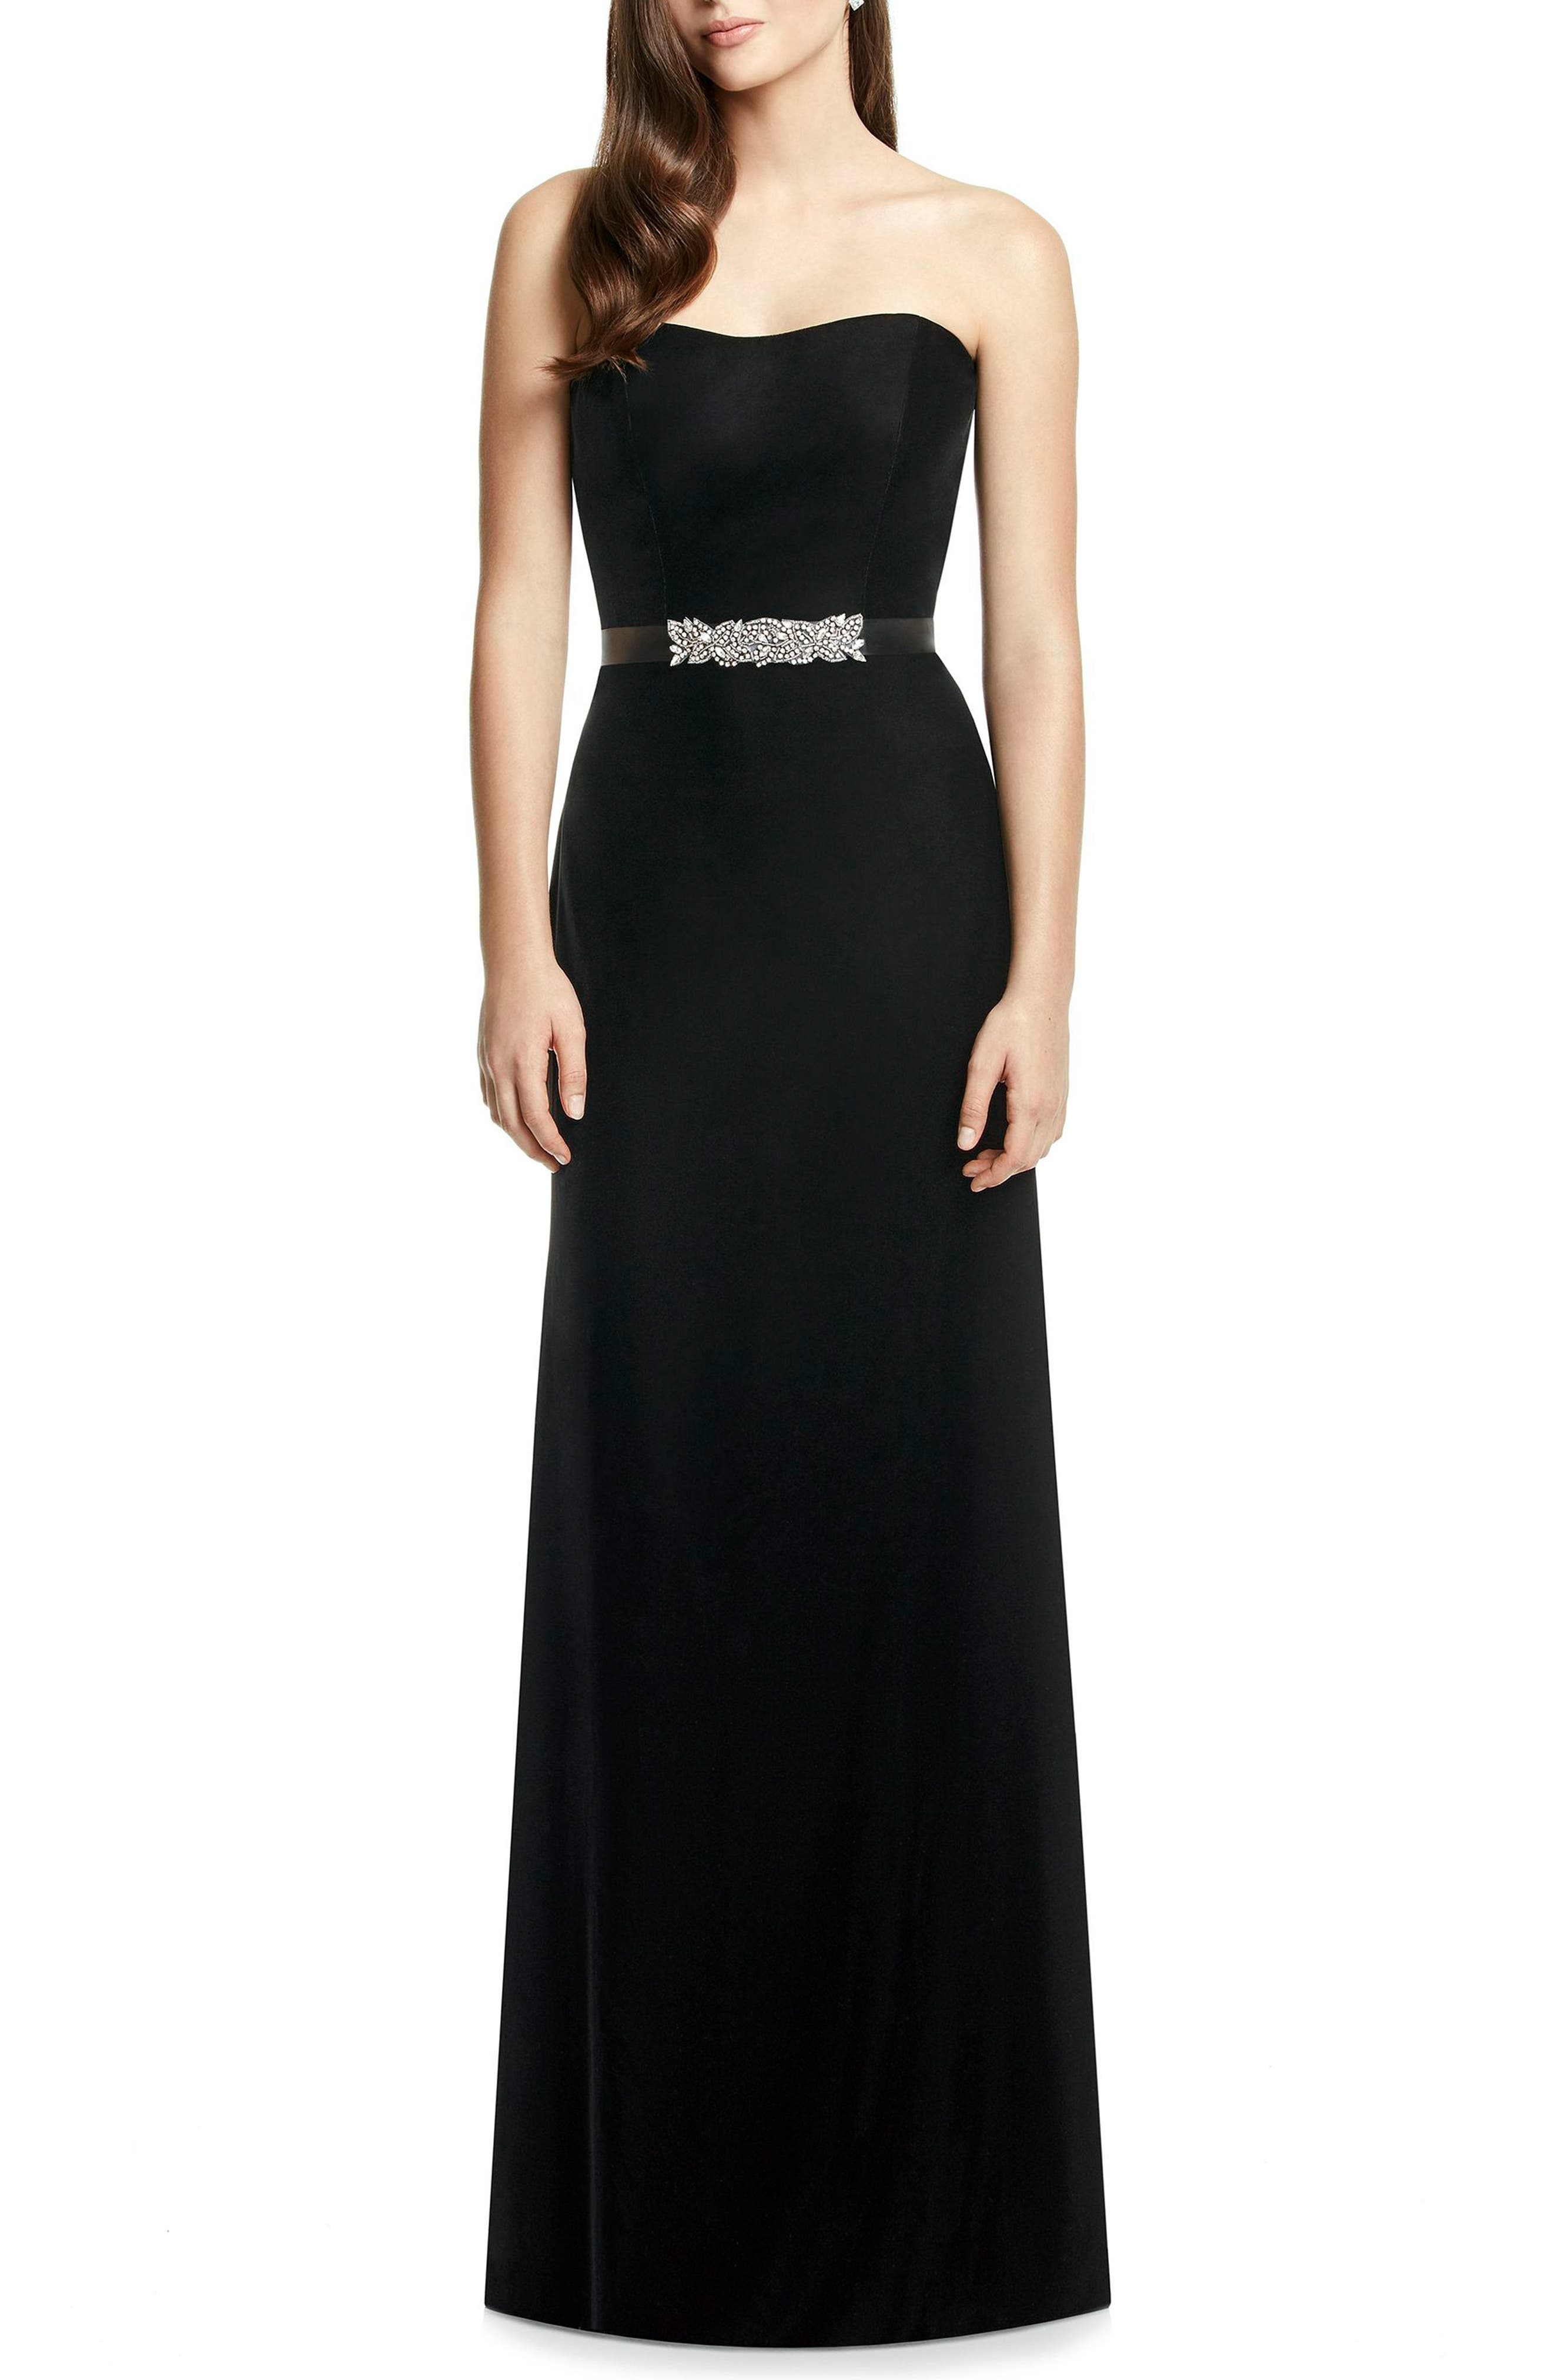 DESSY COLLECTION, Embellished Belt Strapless Velvet Gown, Main thumbnail 1, color, BLACK